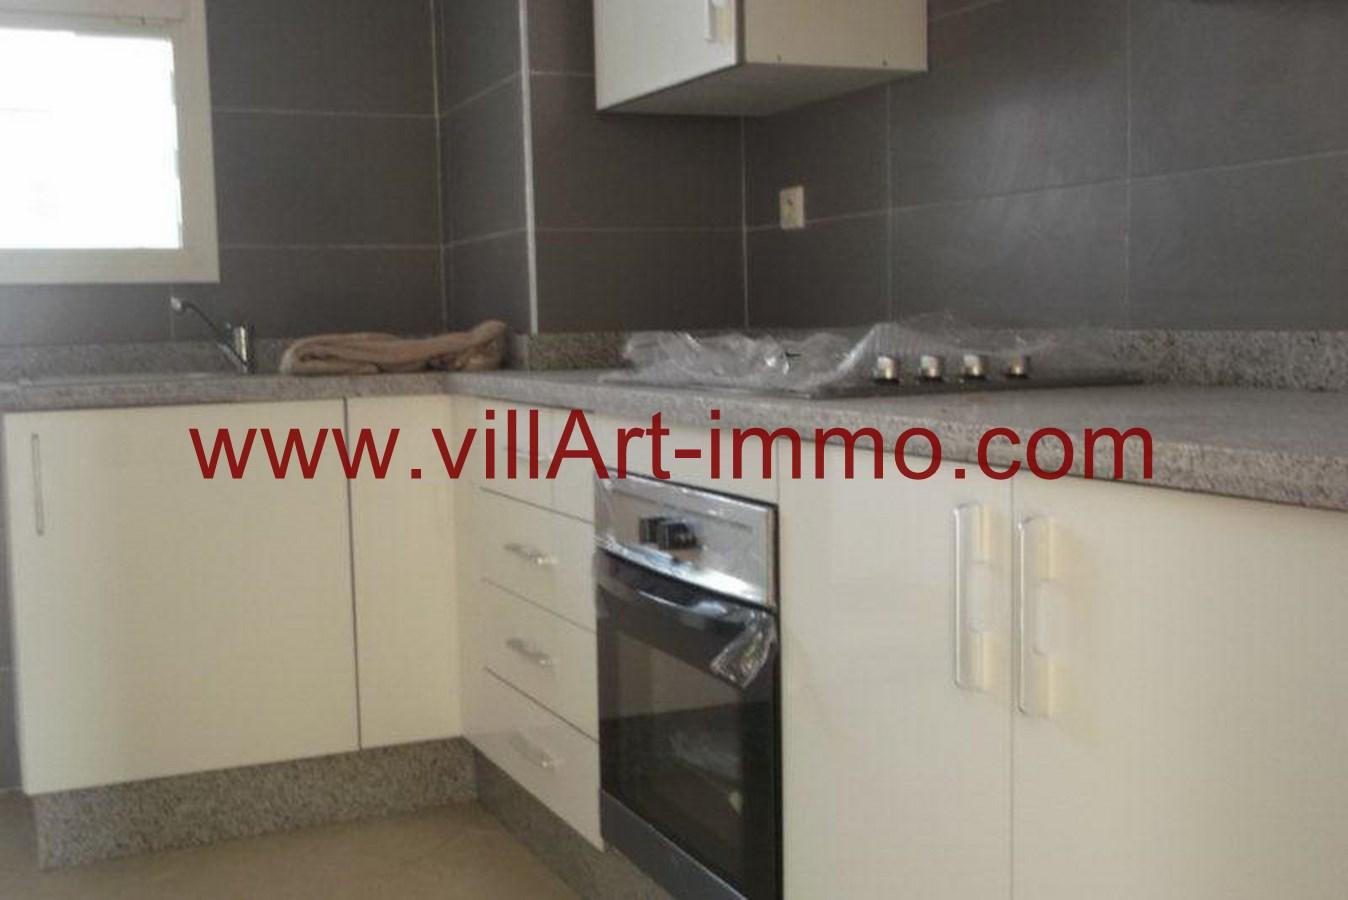 2-Location-Appartement-Non meublé-Tanger-Cuisine-L736-Villart immo